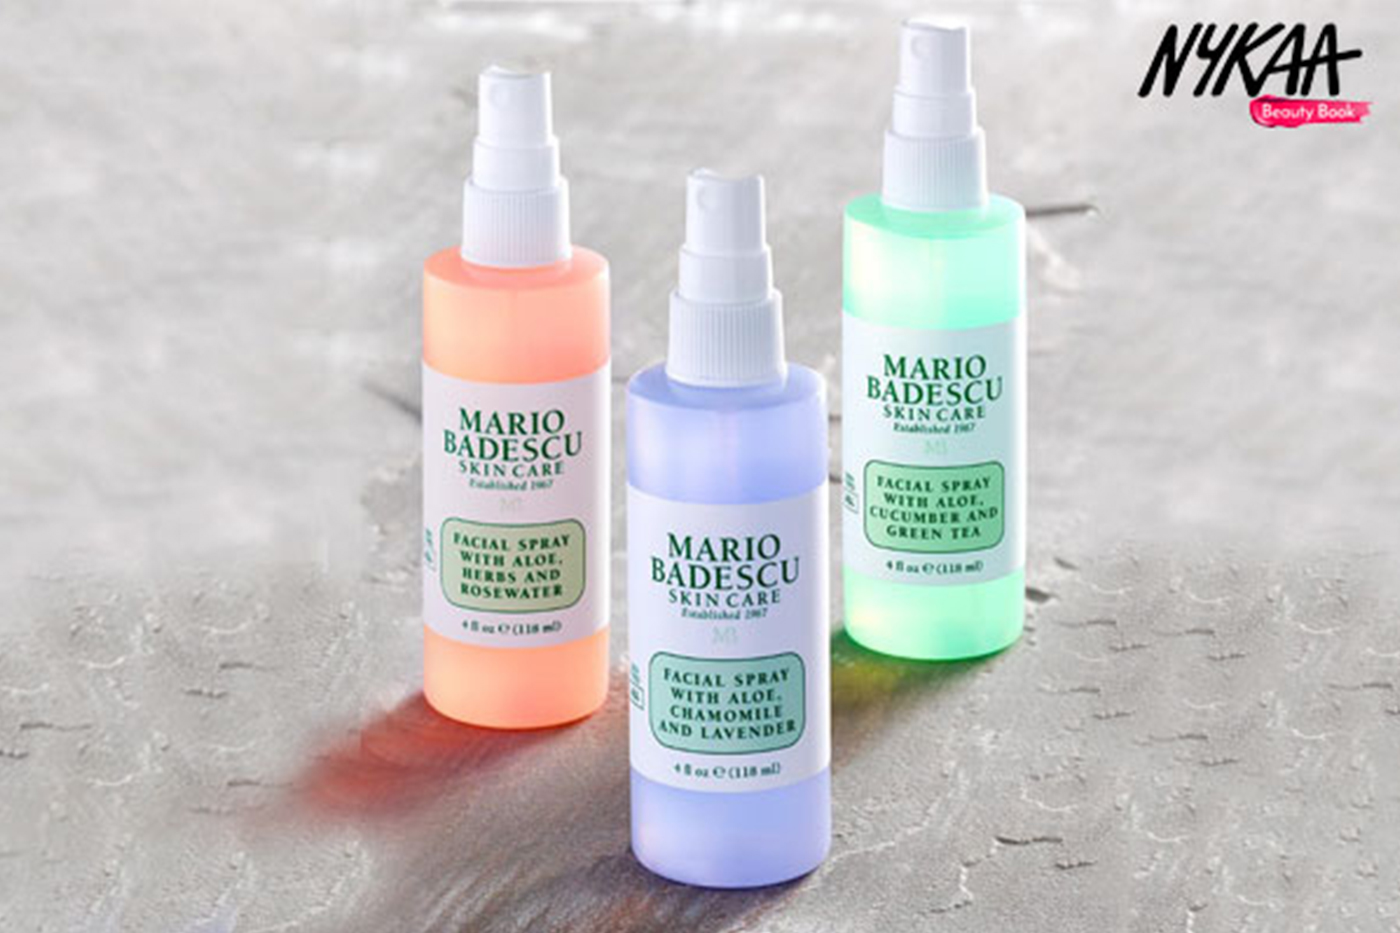 Nykaa unveils Mario Badescu skincare brand in India